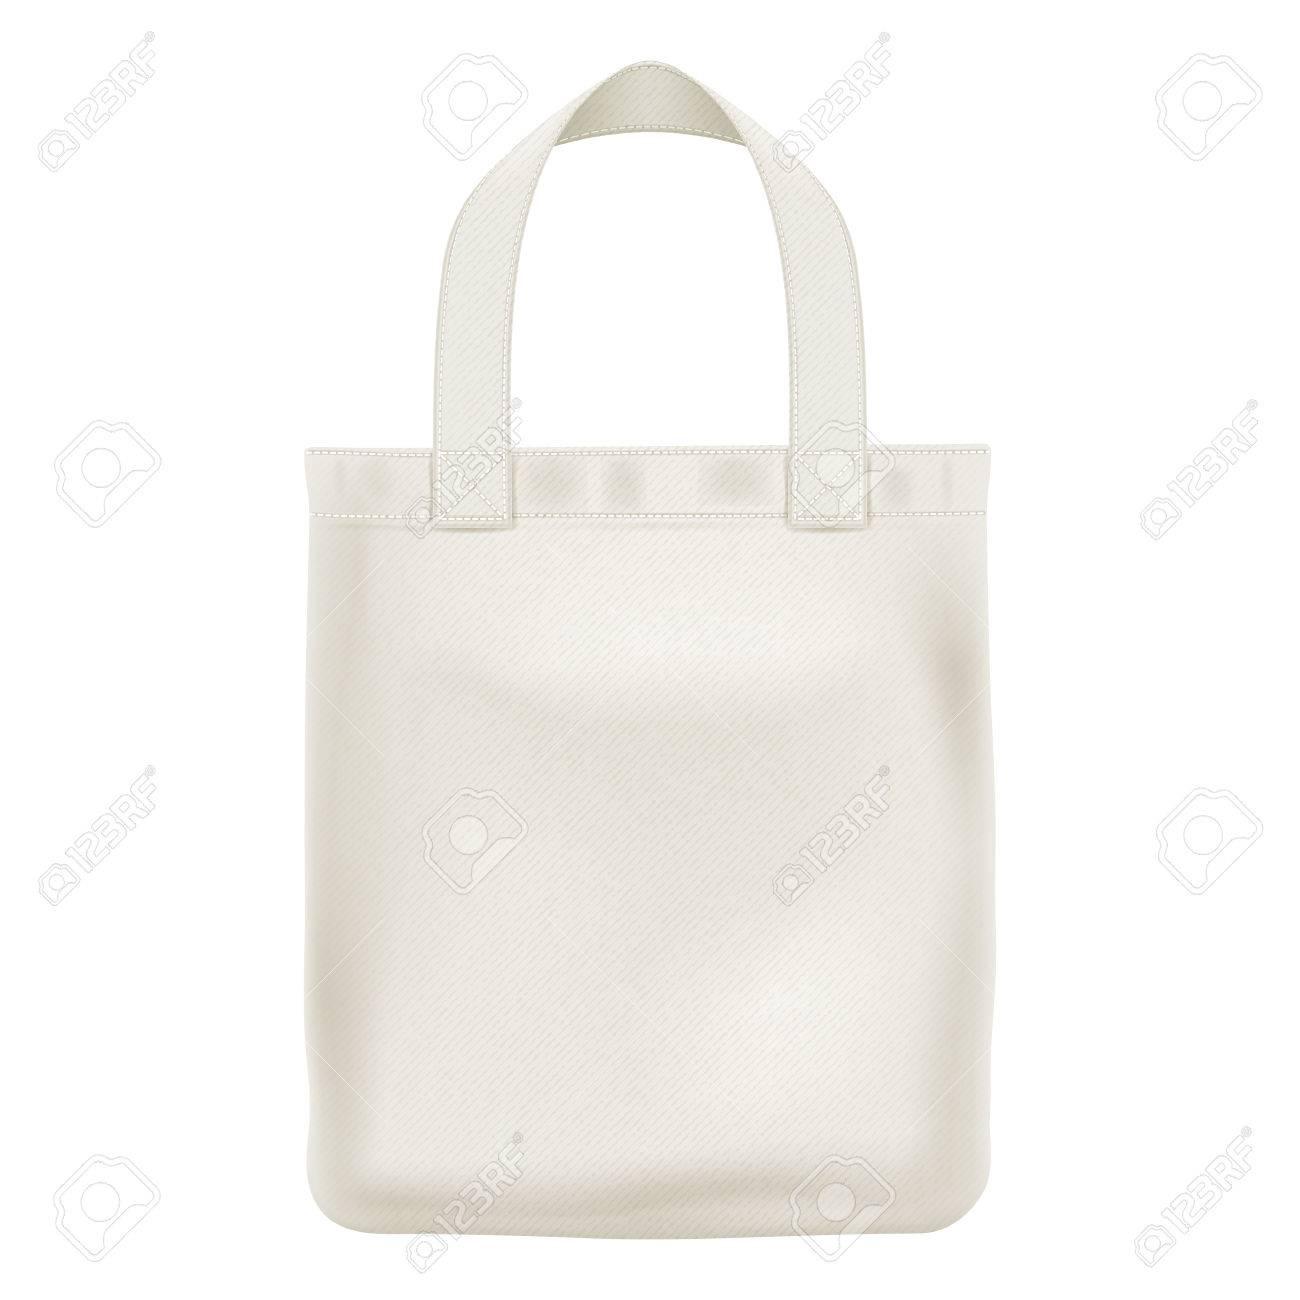 eco textile tote shopper bag vector illustration good for branding